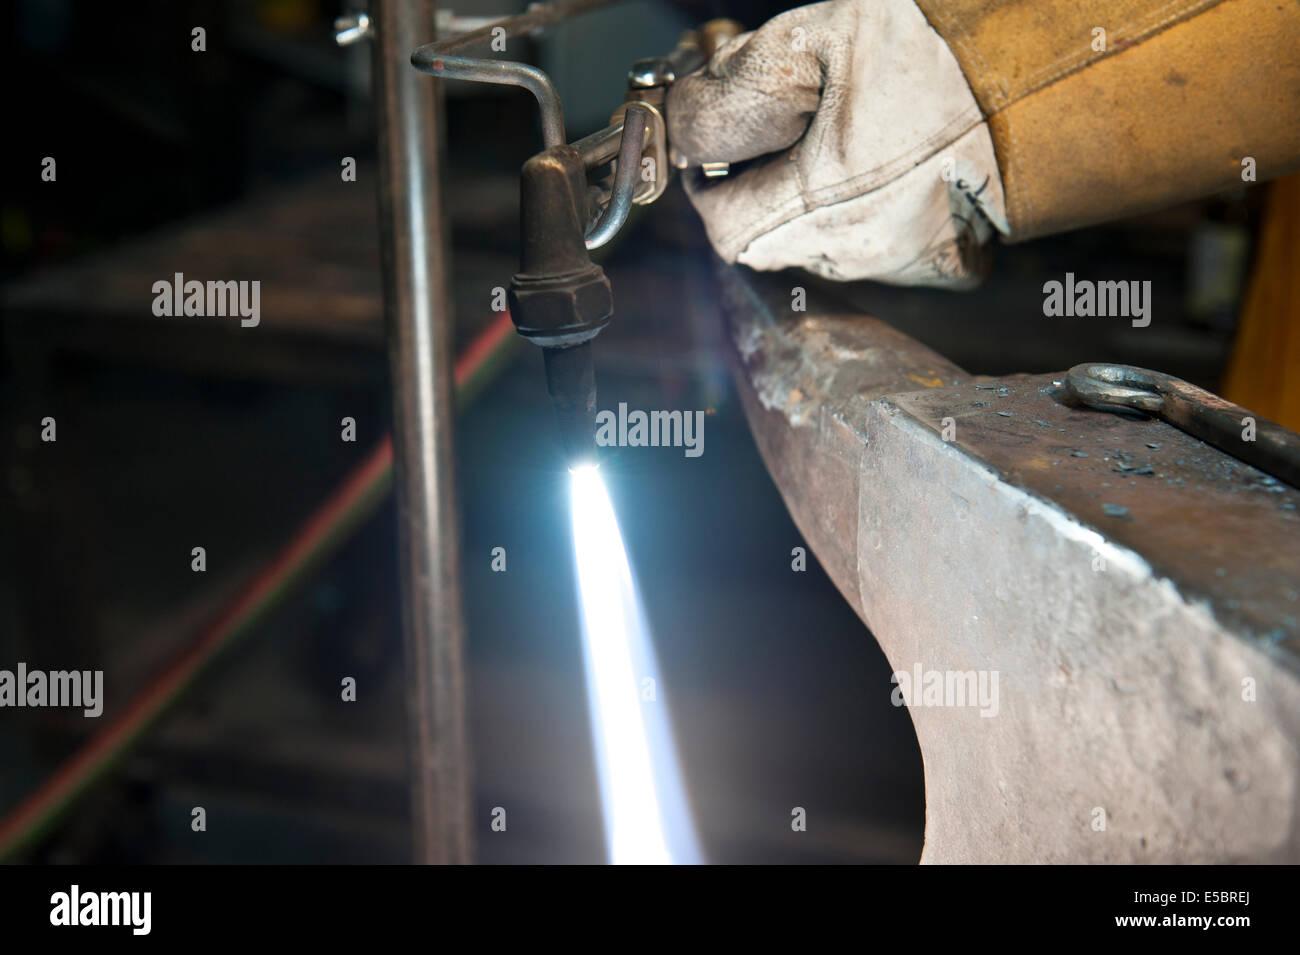 Skilled Metal Fabricator Stock Photos & Skilled Metal